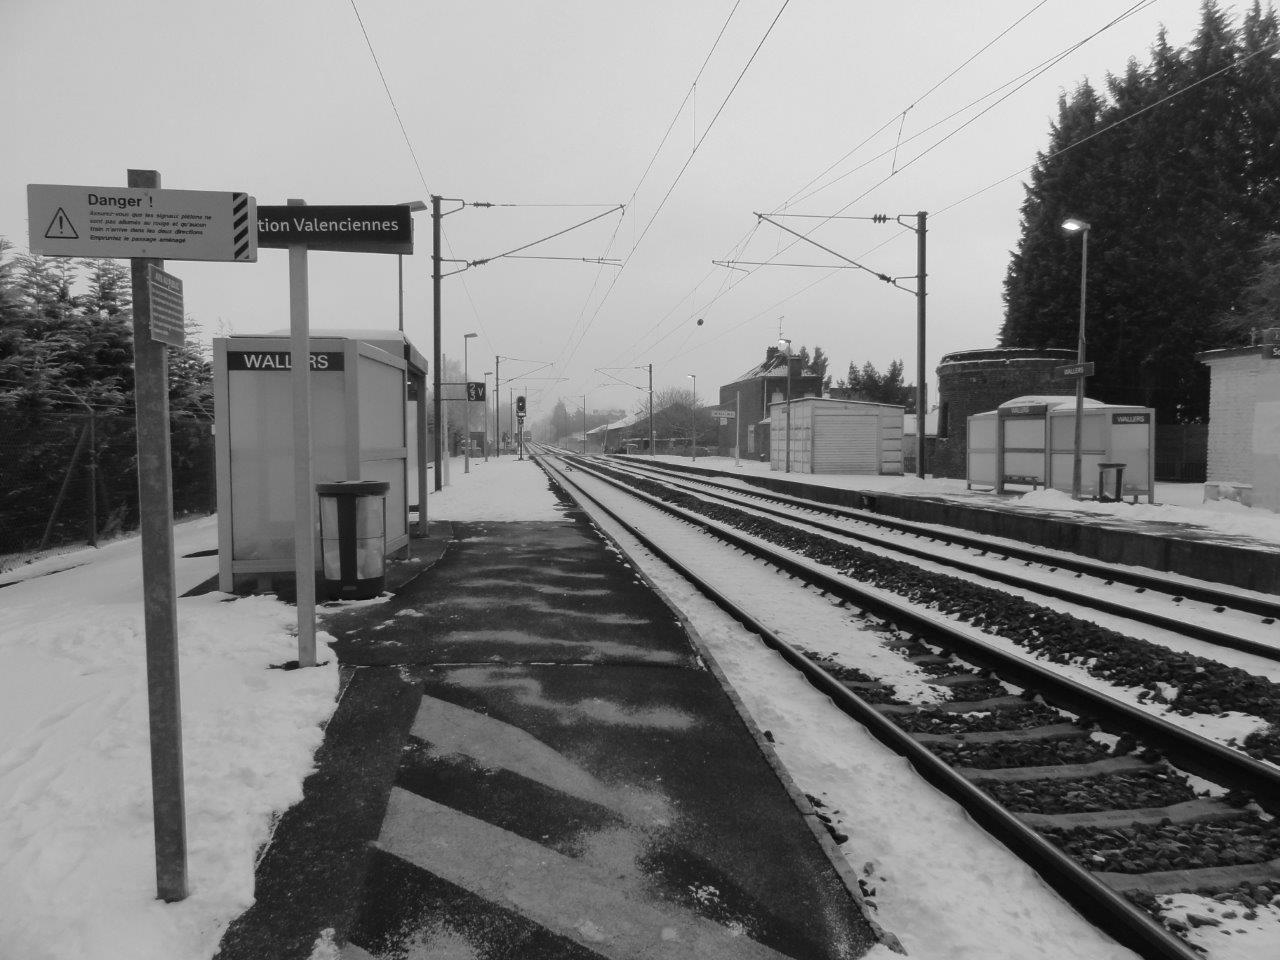 gare-de-wallers-train-station